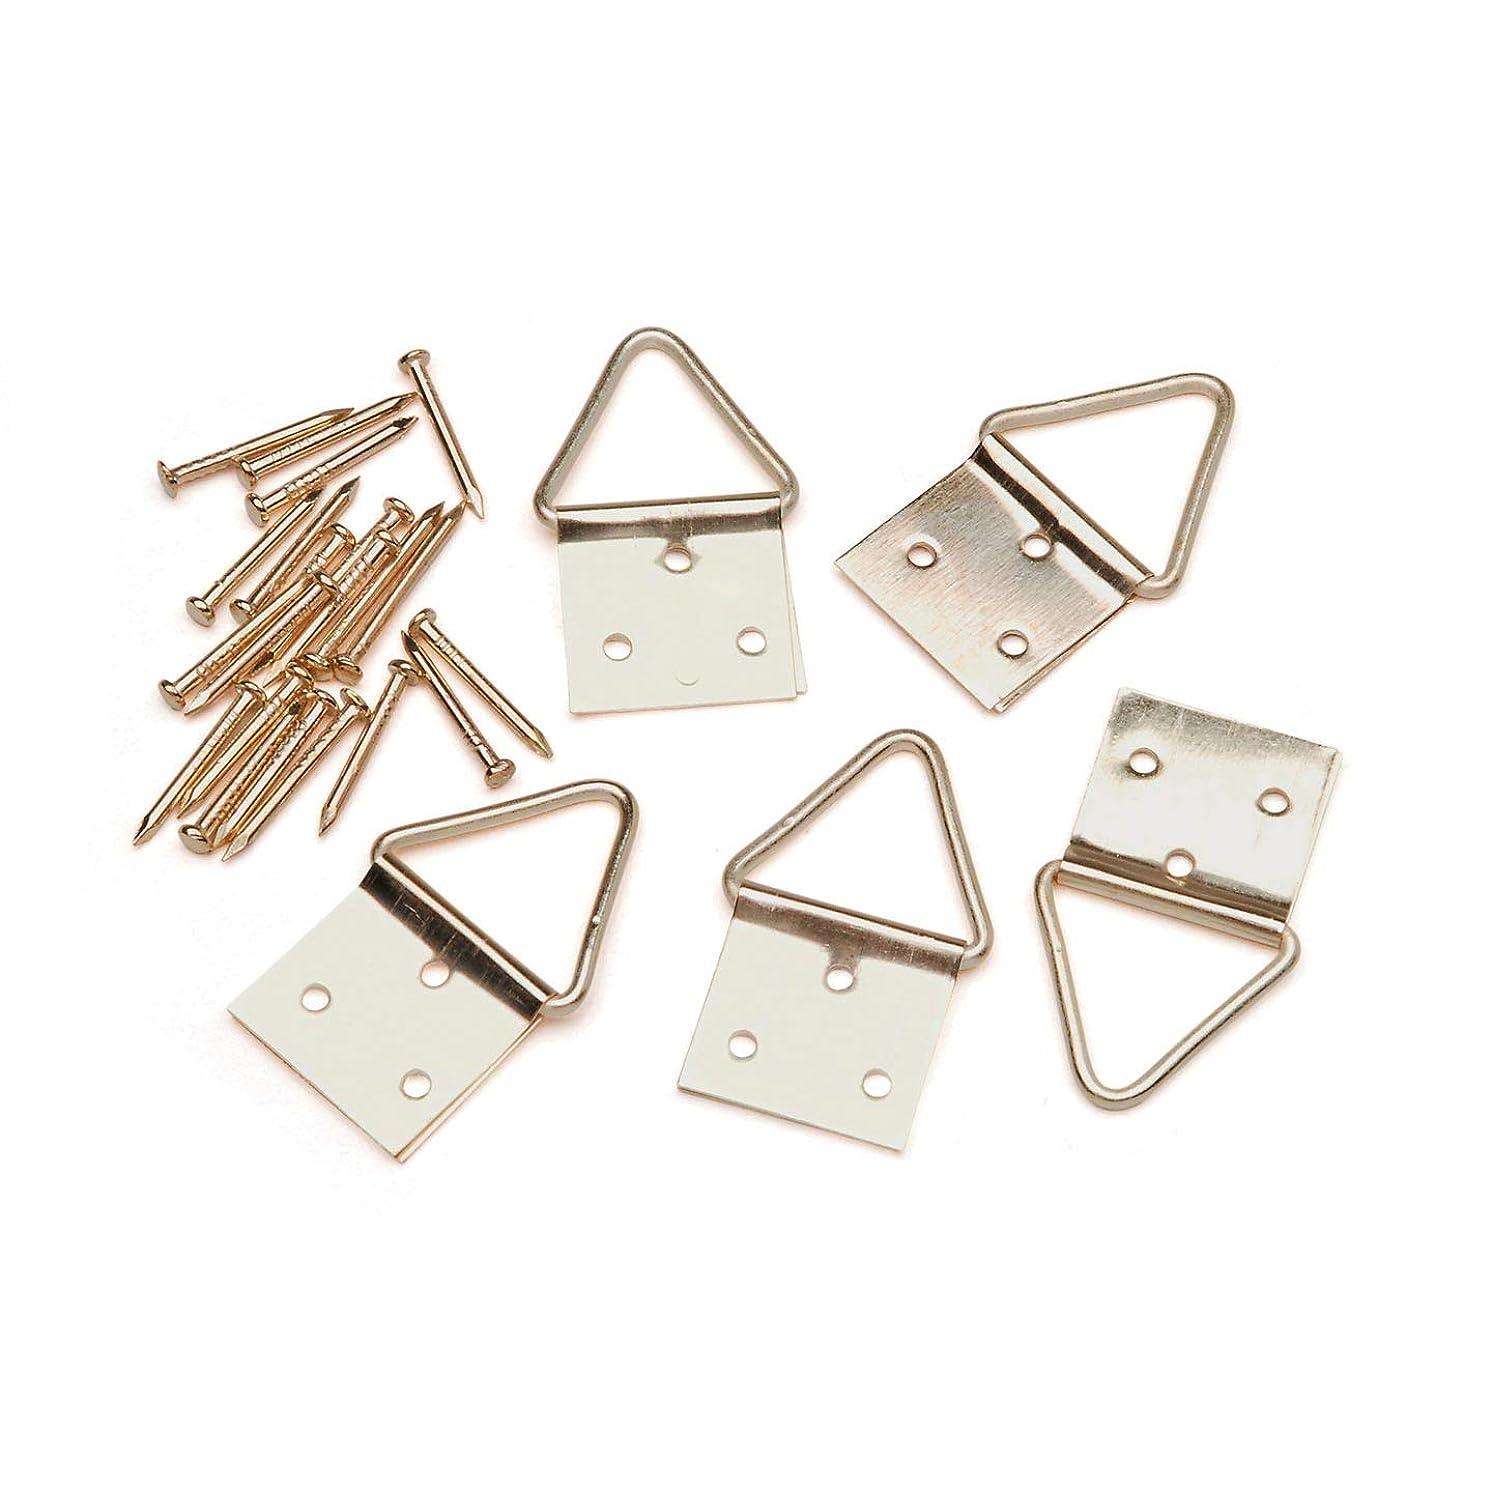 Bulk Buy: Darice DIY Crafts D Strap Hangers Gold 10 pieces (2-Pack) 7000-37